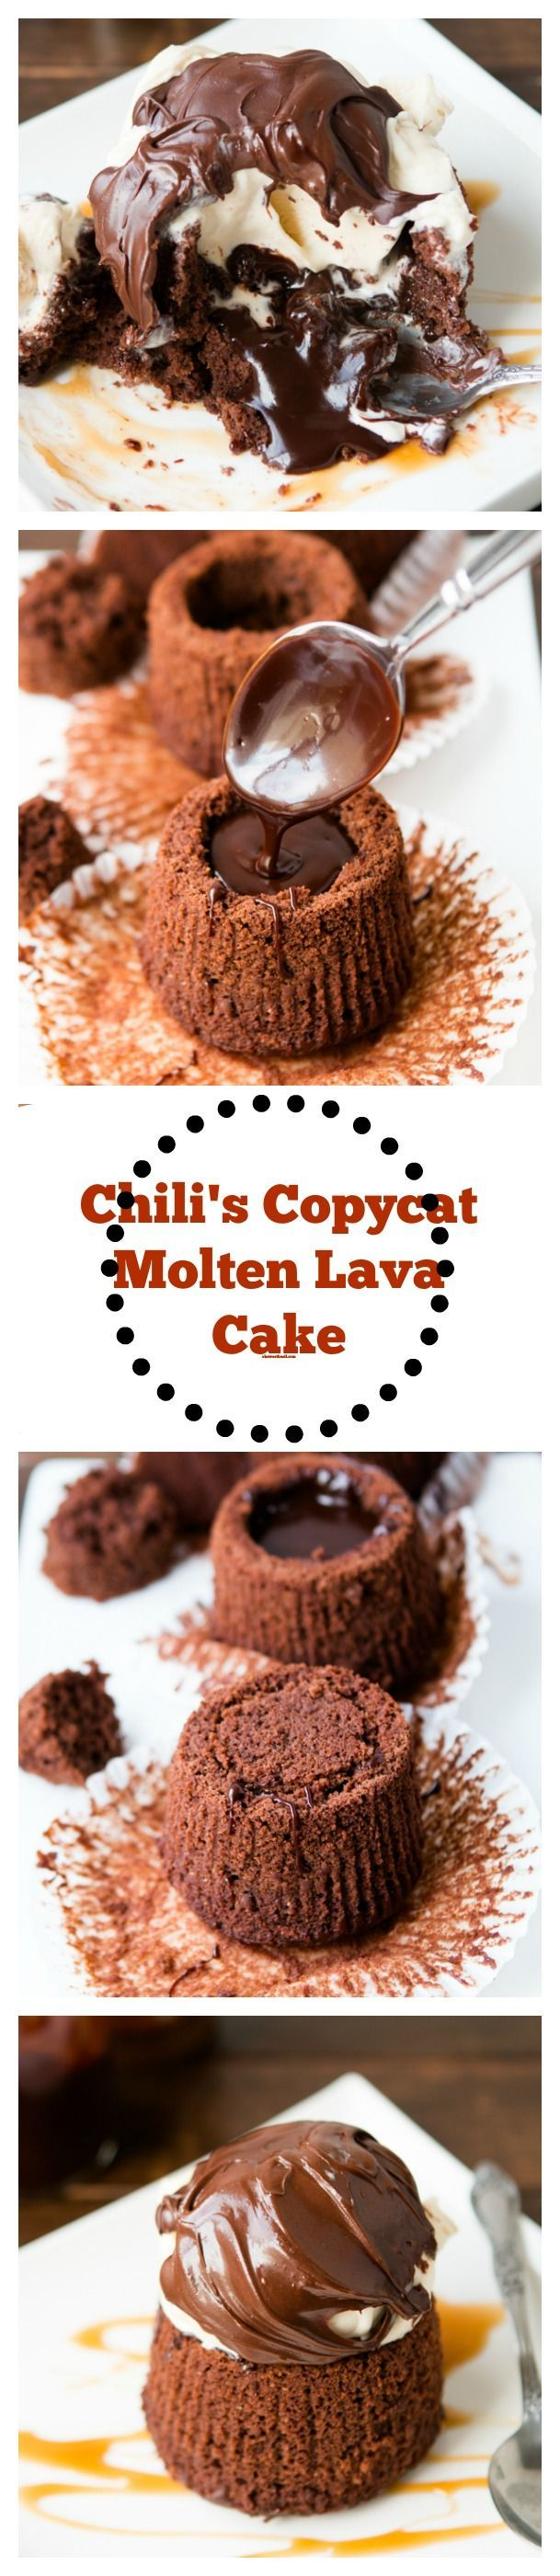 Chili's Copycat Molten Lava Cakes ohsweetbasil.com. (scheduled via http://www.tailwindapp.com?utm_source=pinterest&utm_medium=twpin&utm_content=post1157203&utm_campaign=scheduler_attribution)